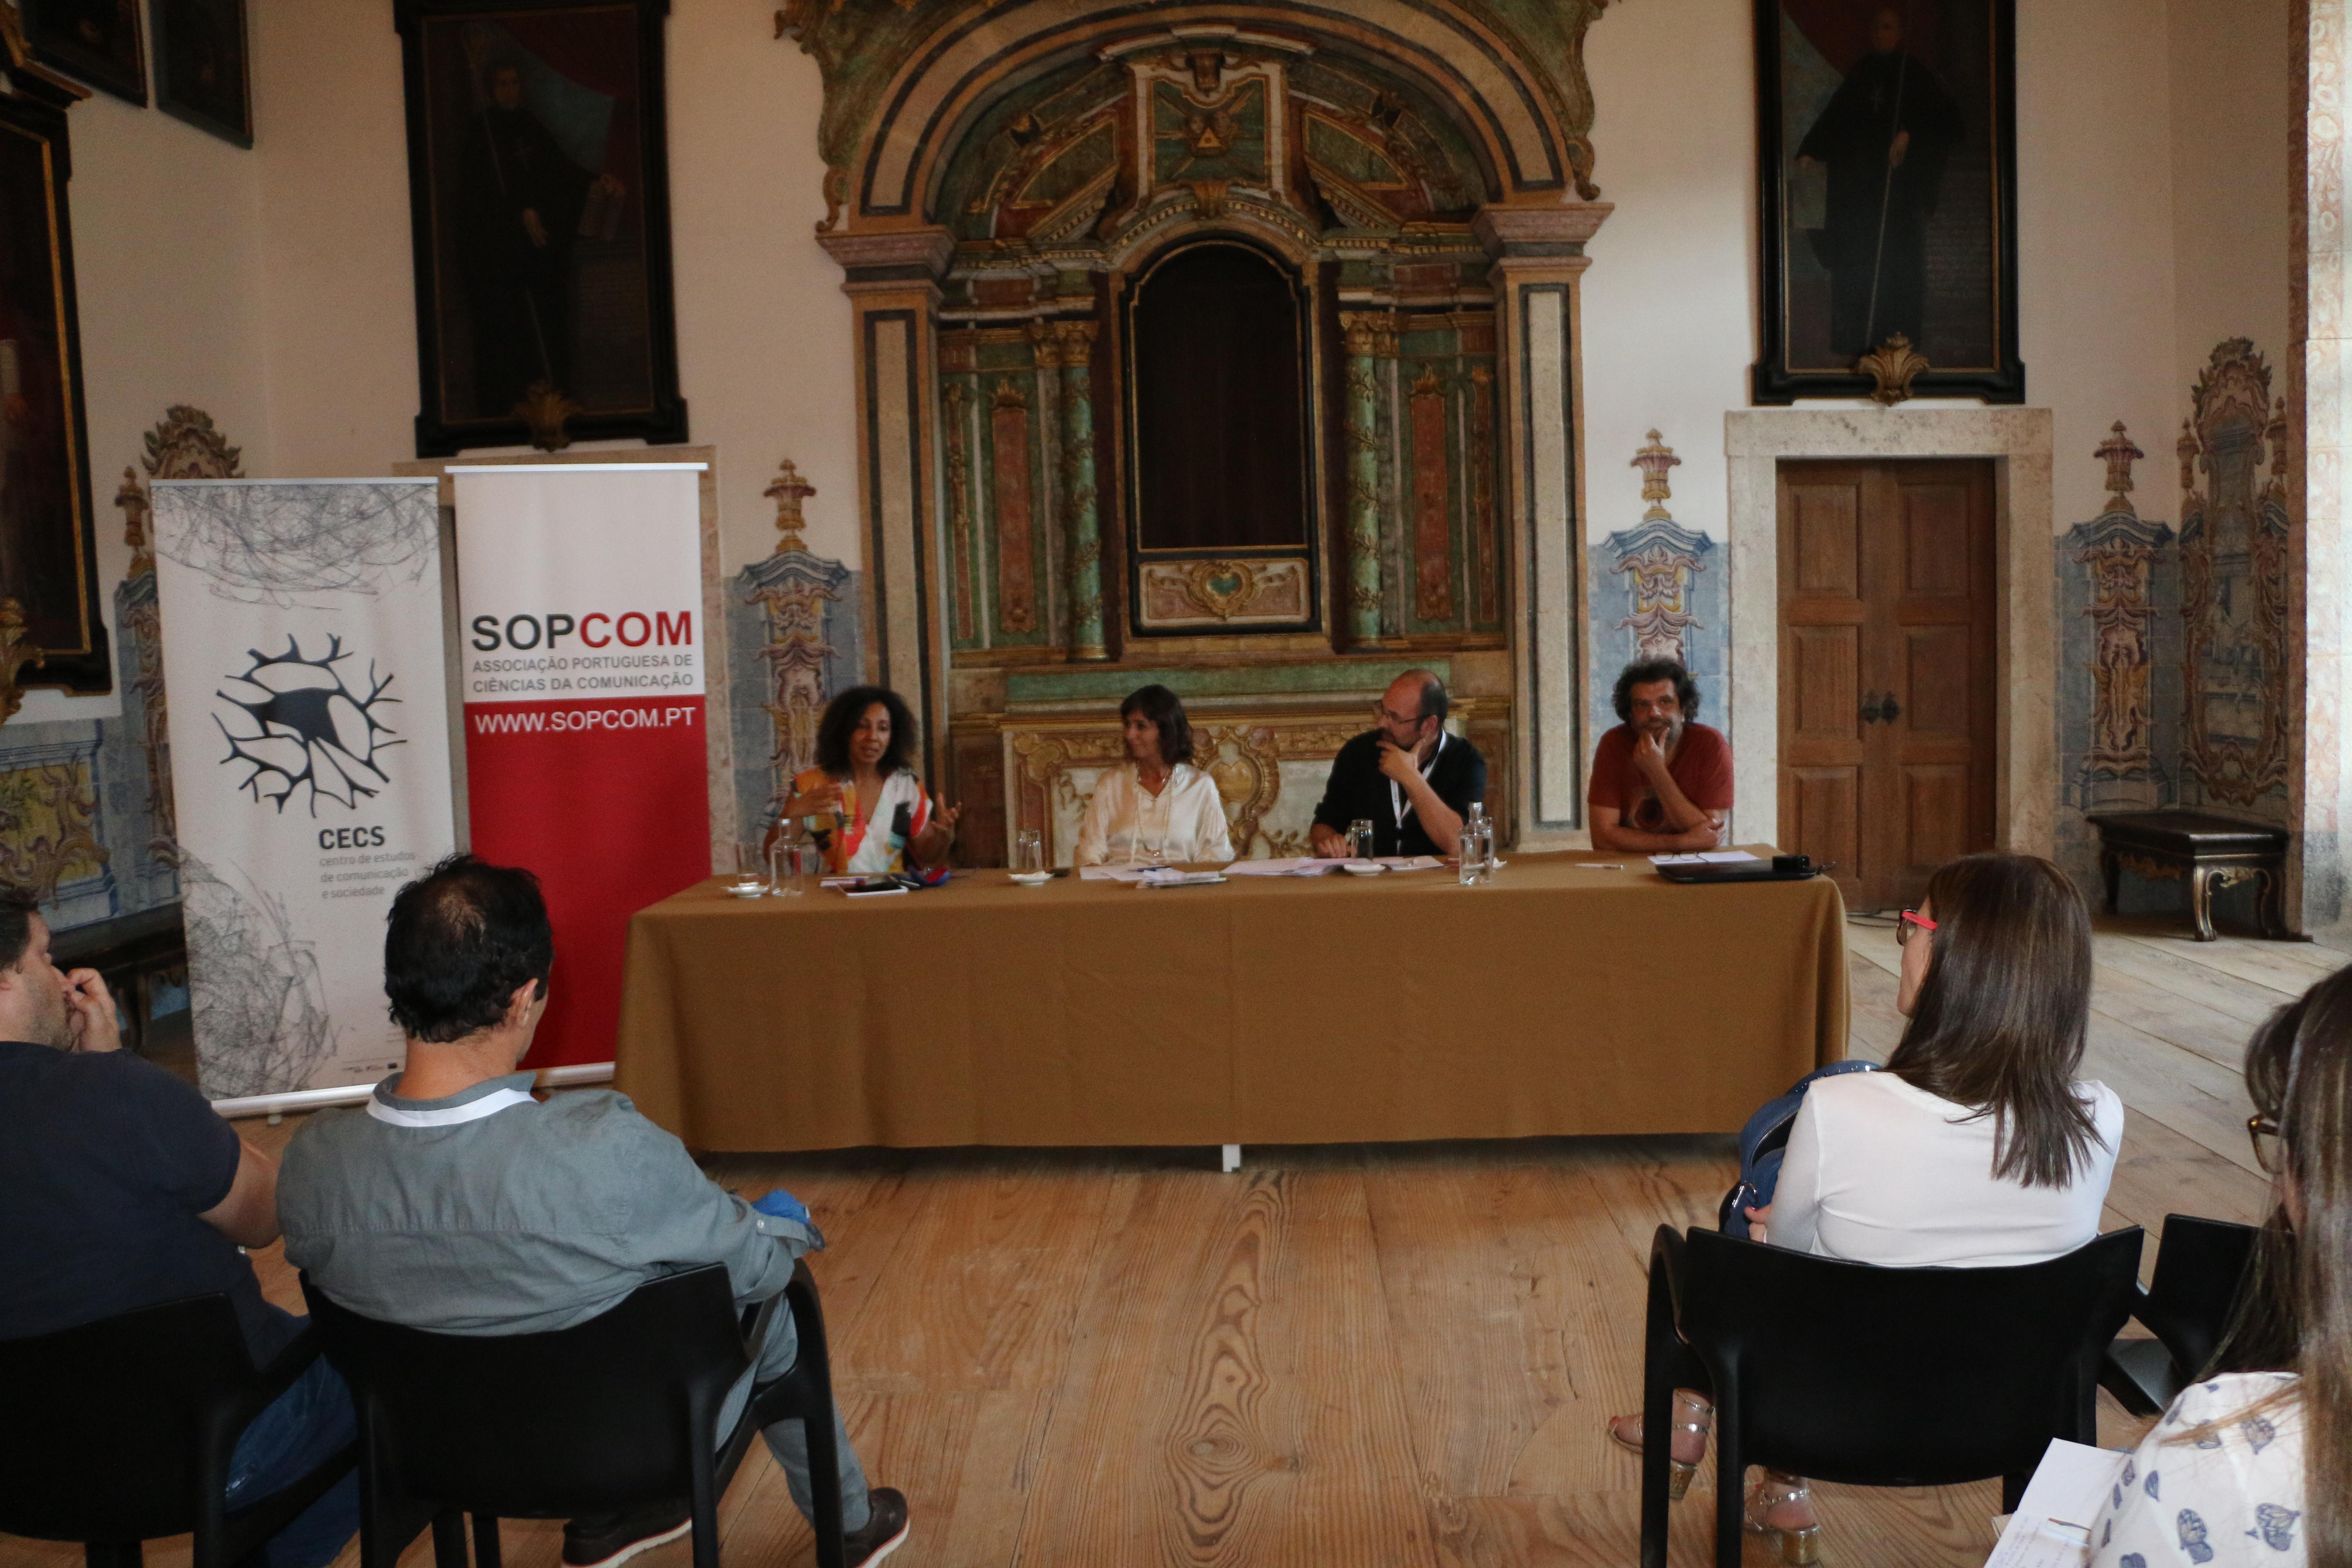 Communicating diversity at the I SOPCOM Intercultural Communication WG Meeting